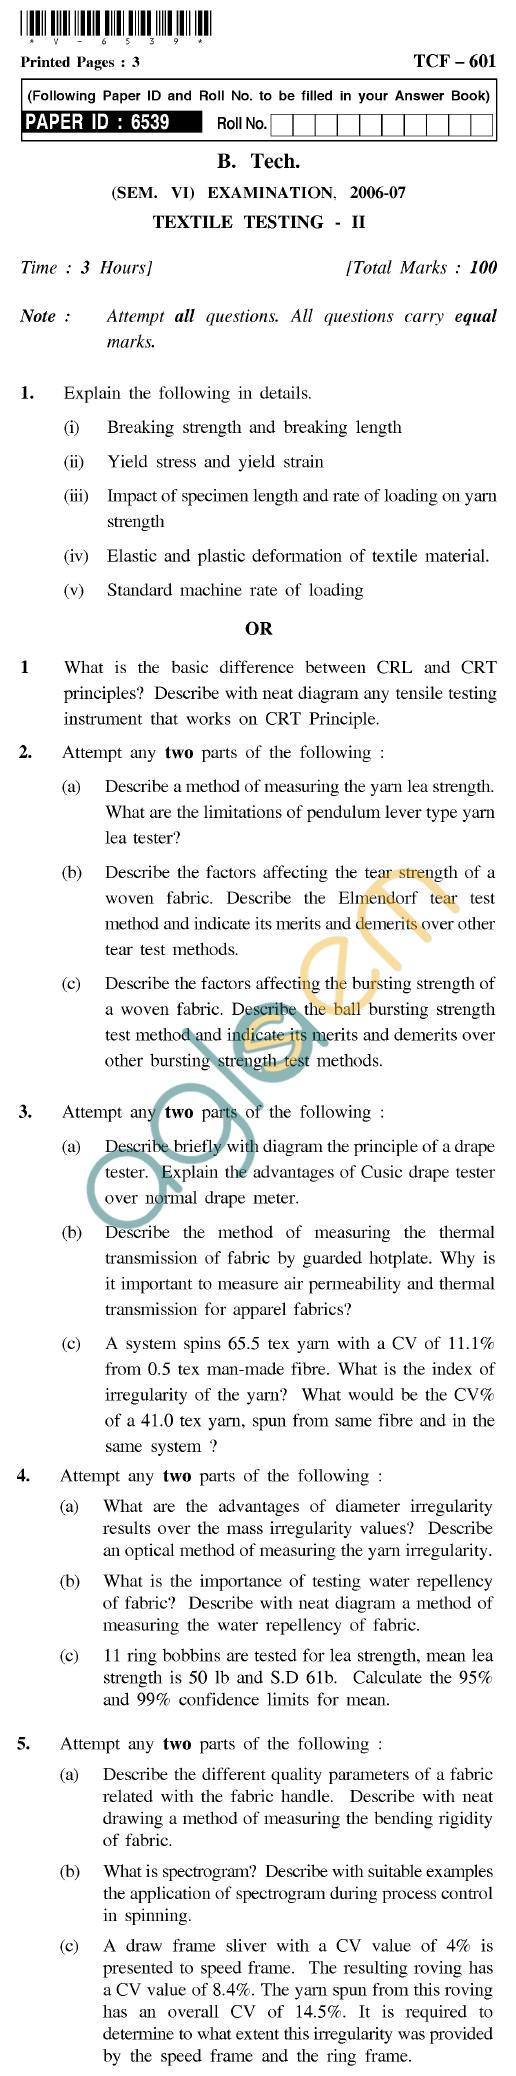 UPTU B.Tech Question Papers - TCF-601 - Textile Testing-II